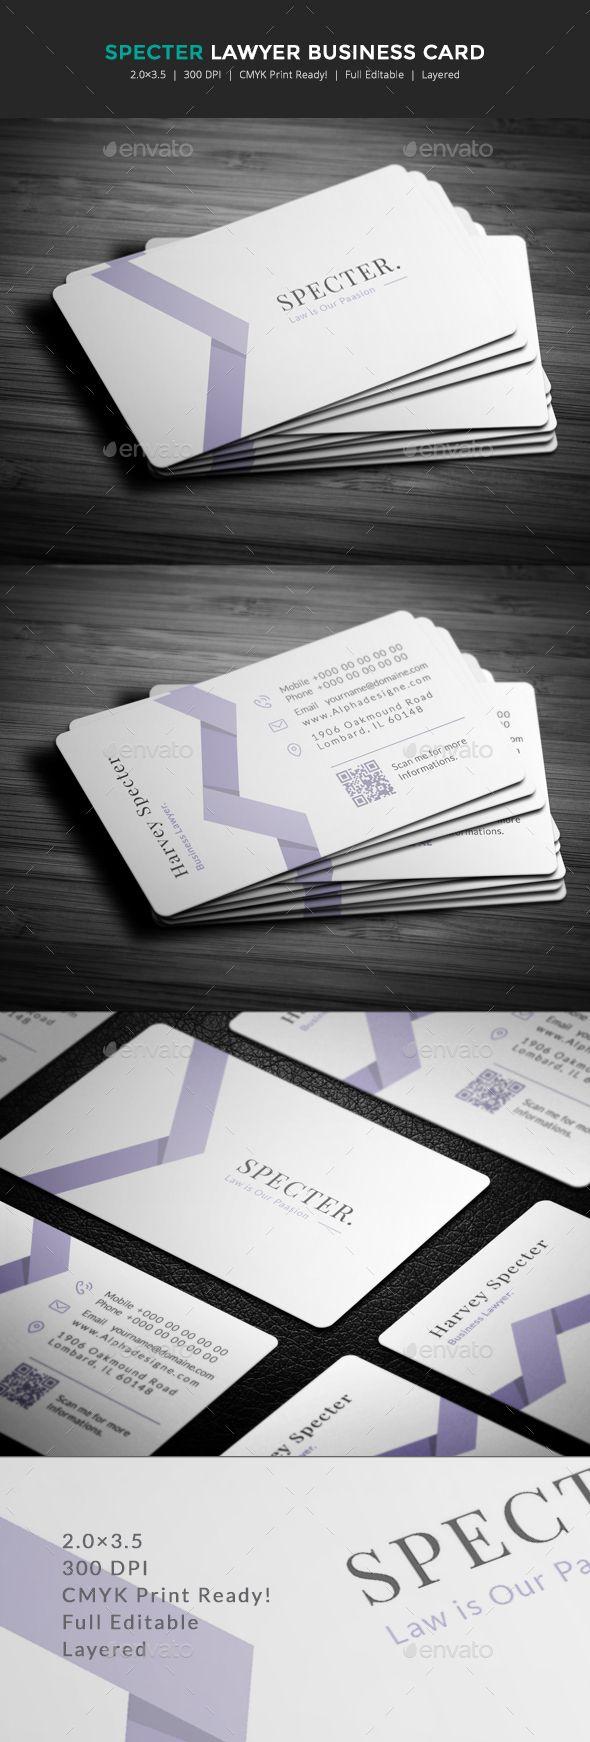 Specter Lawyer Business Card Template PSD